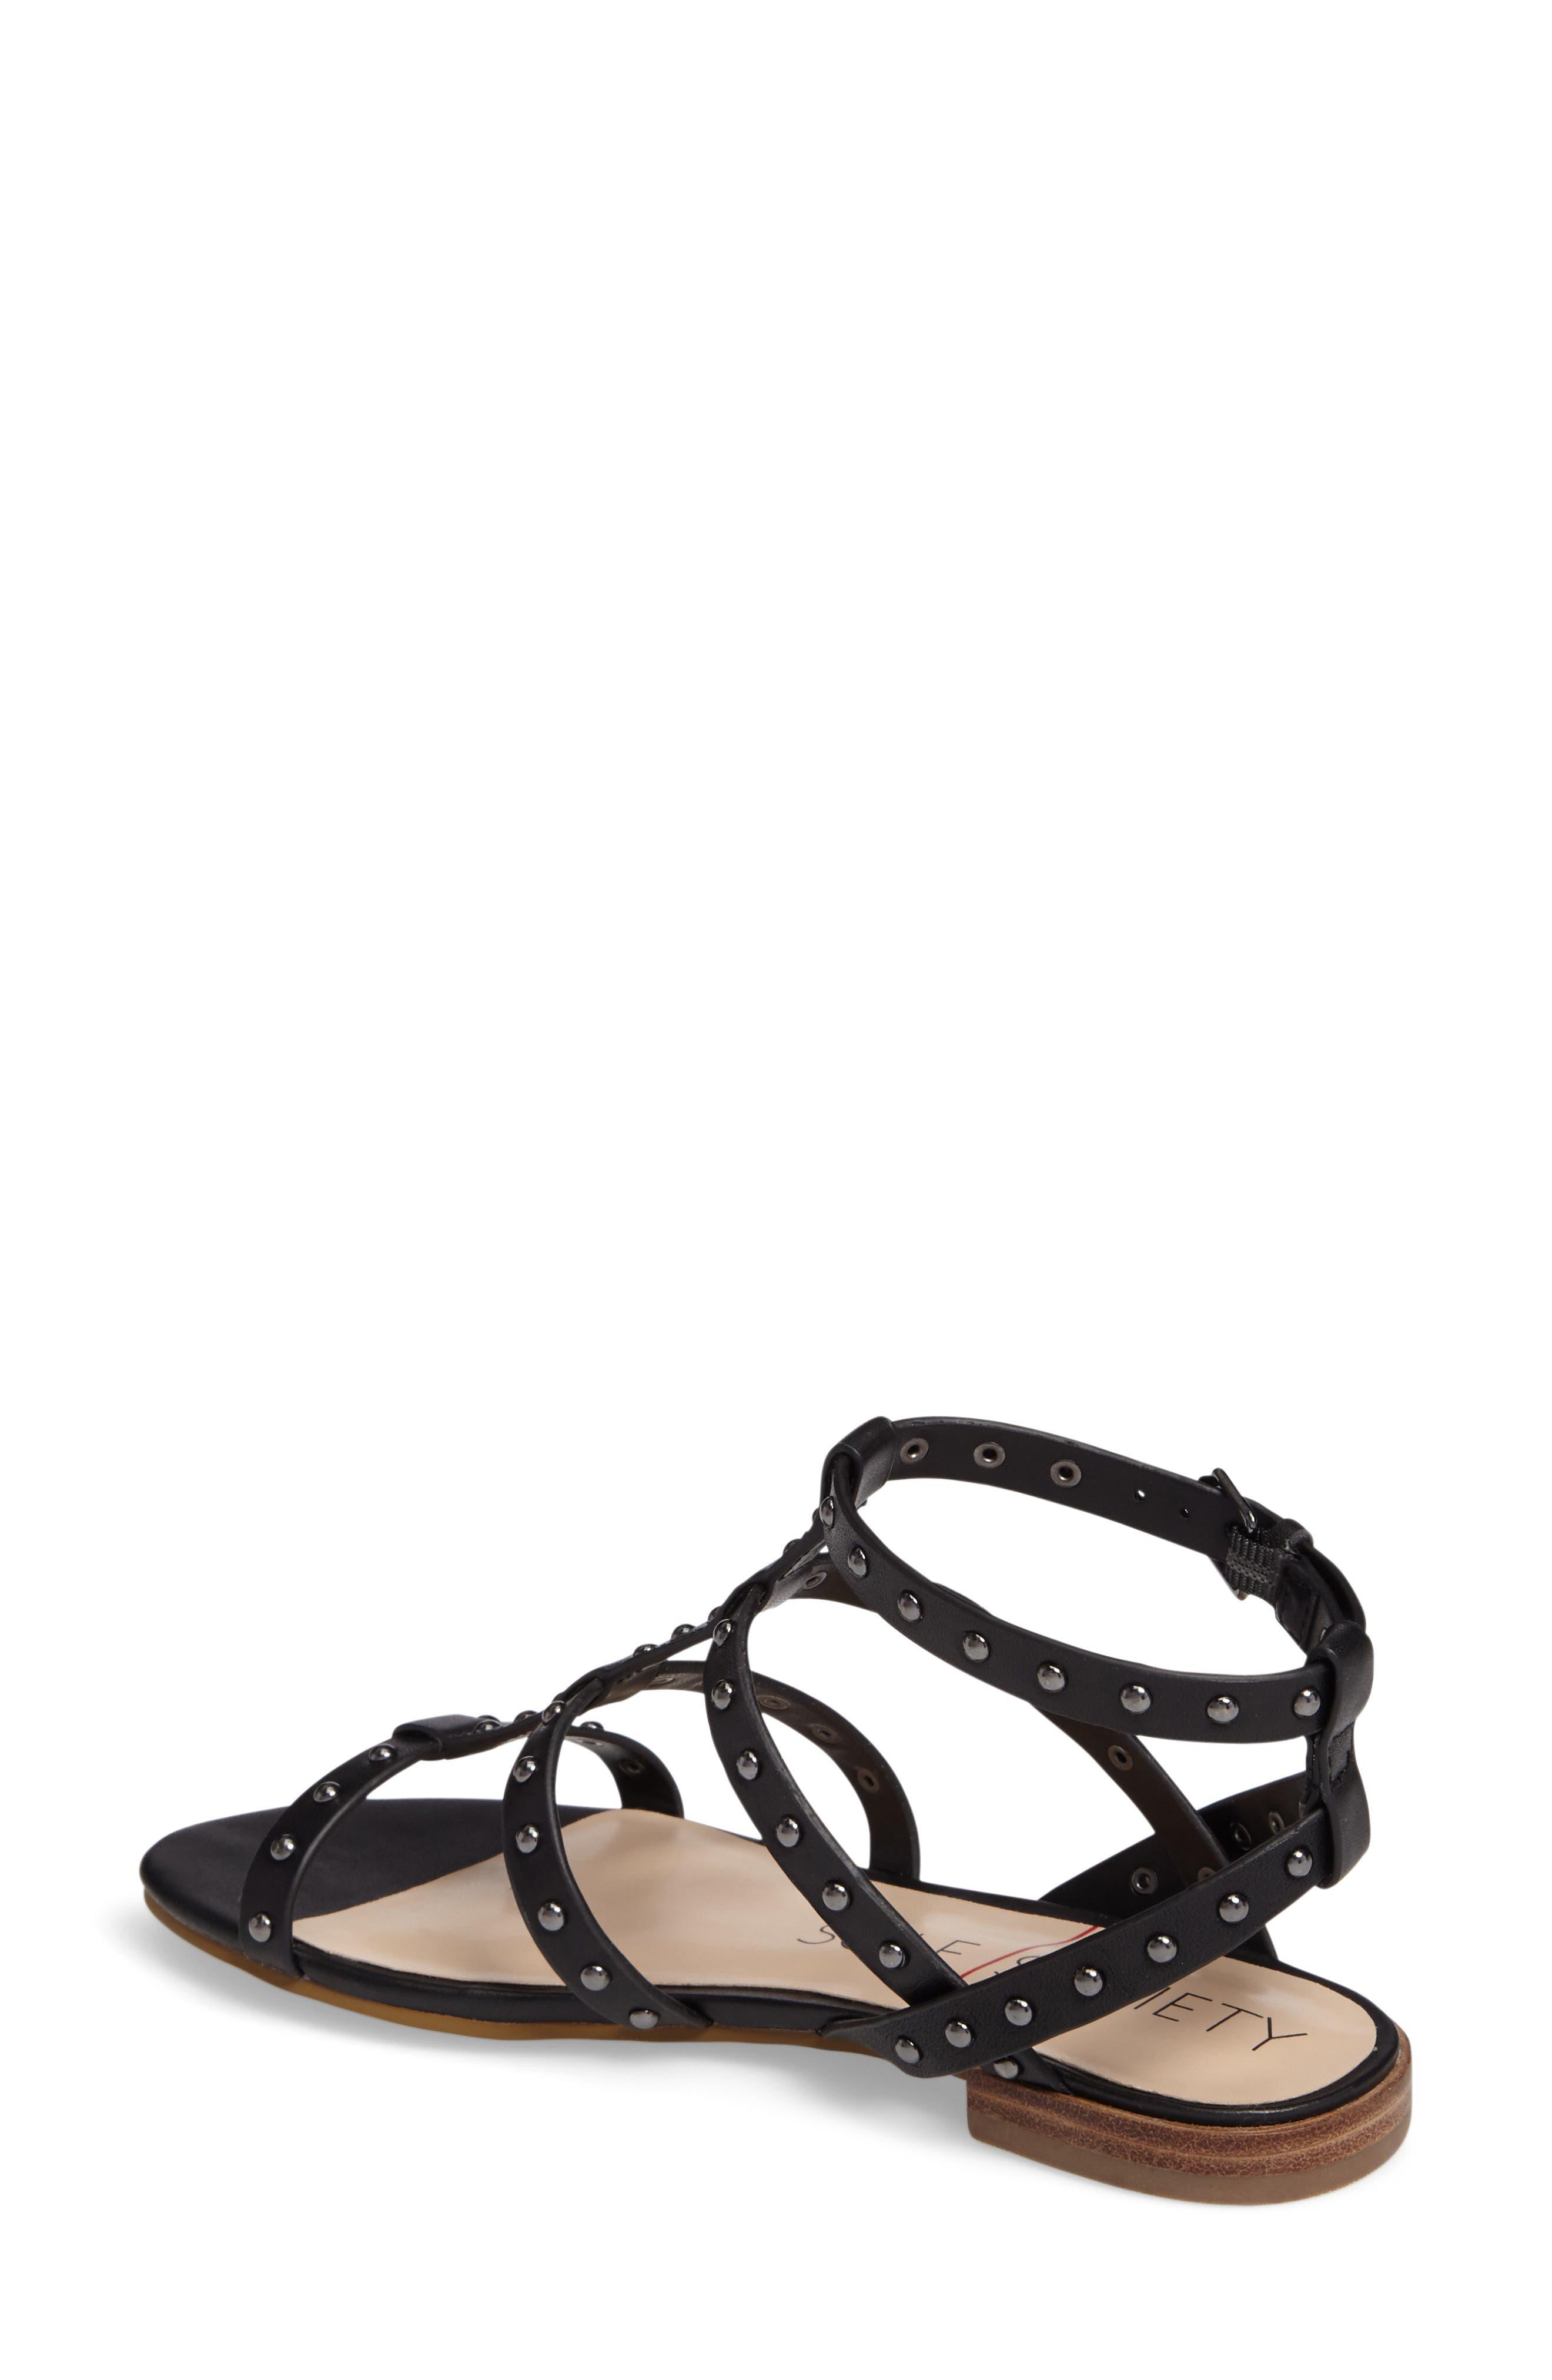 Celine Sandal,                             Alternate thumbnail 2, color,                             Black Leather